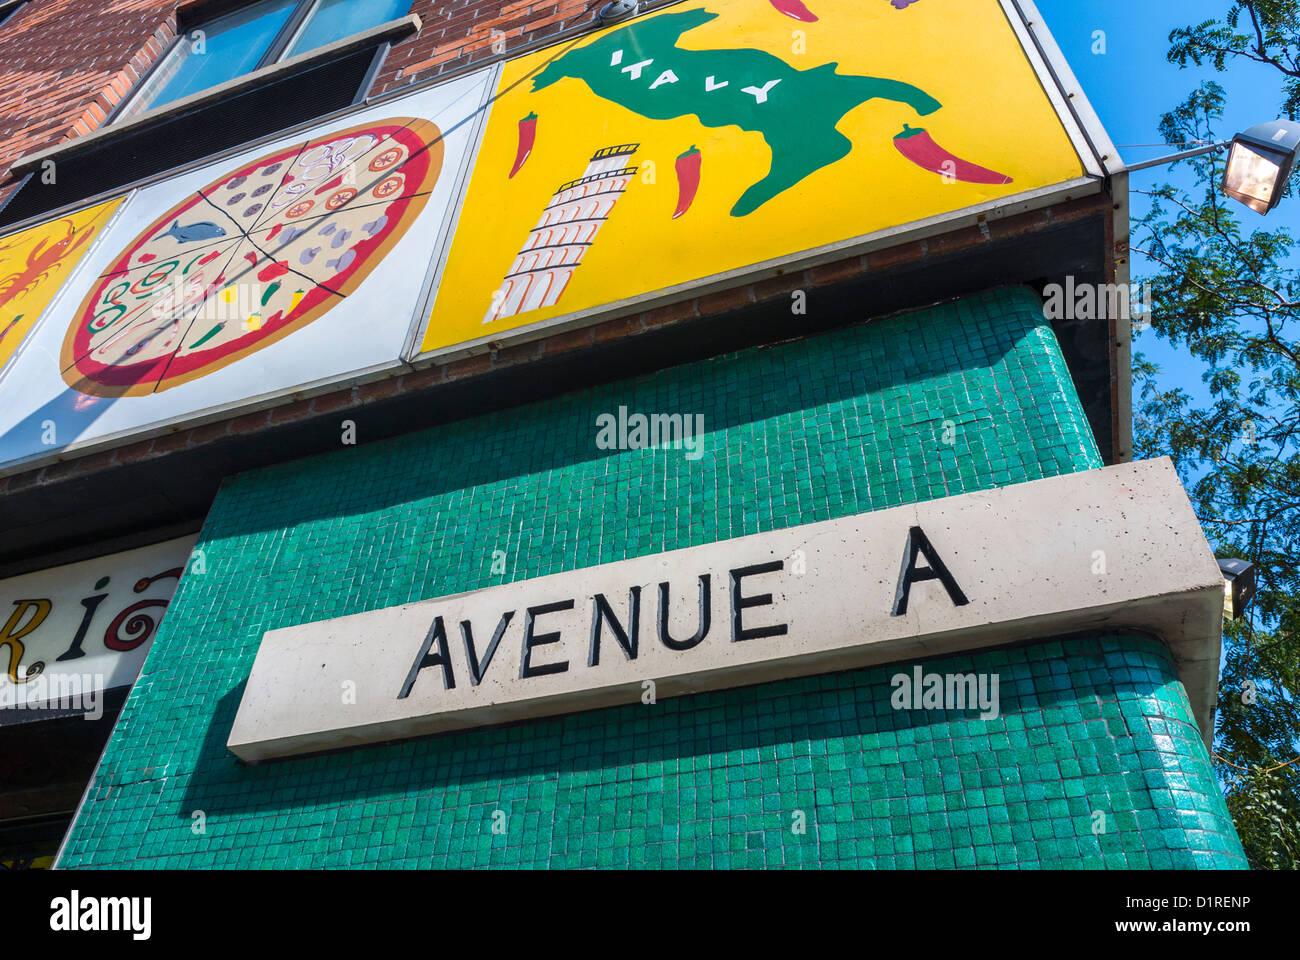 Italian Pizzeria Restaurant Stock Photos & Italian Pizzeria ...